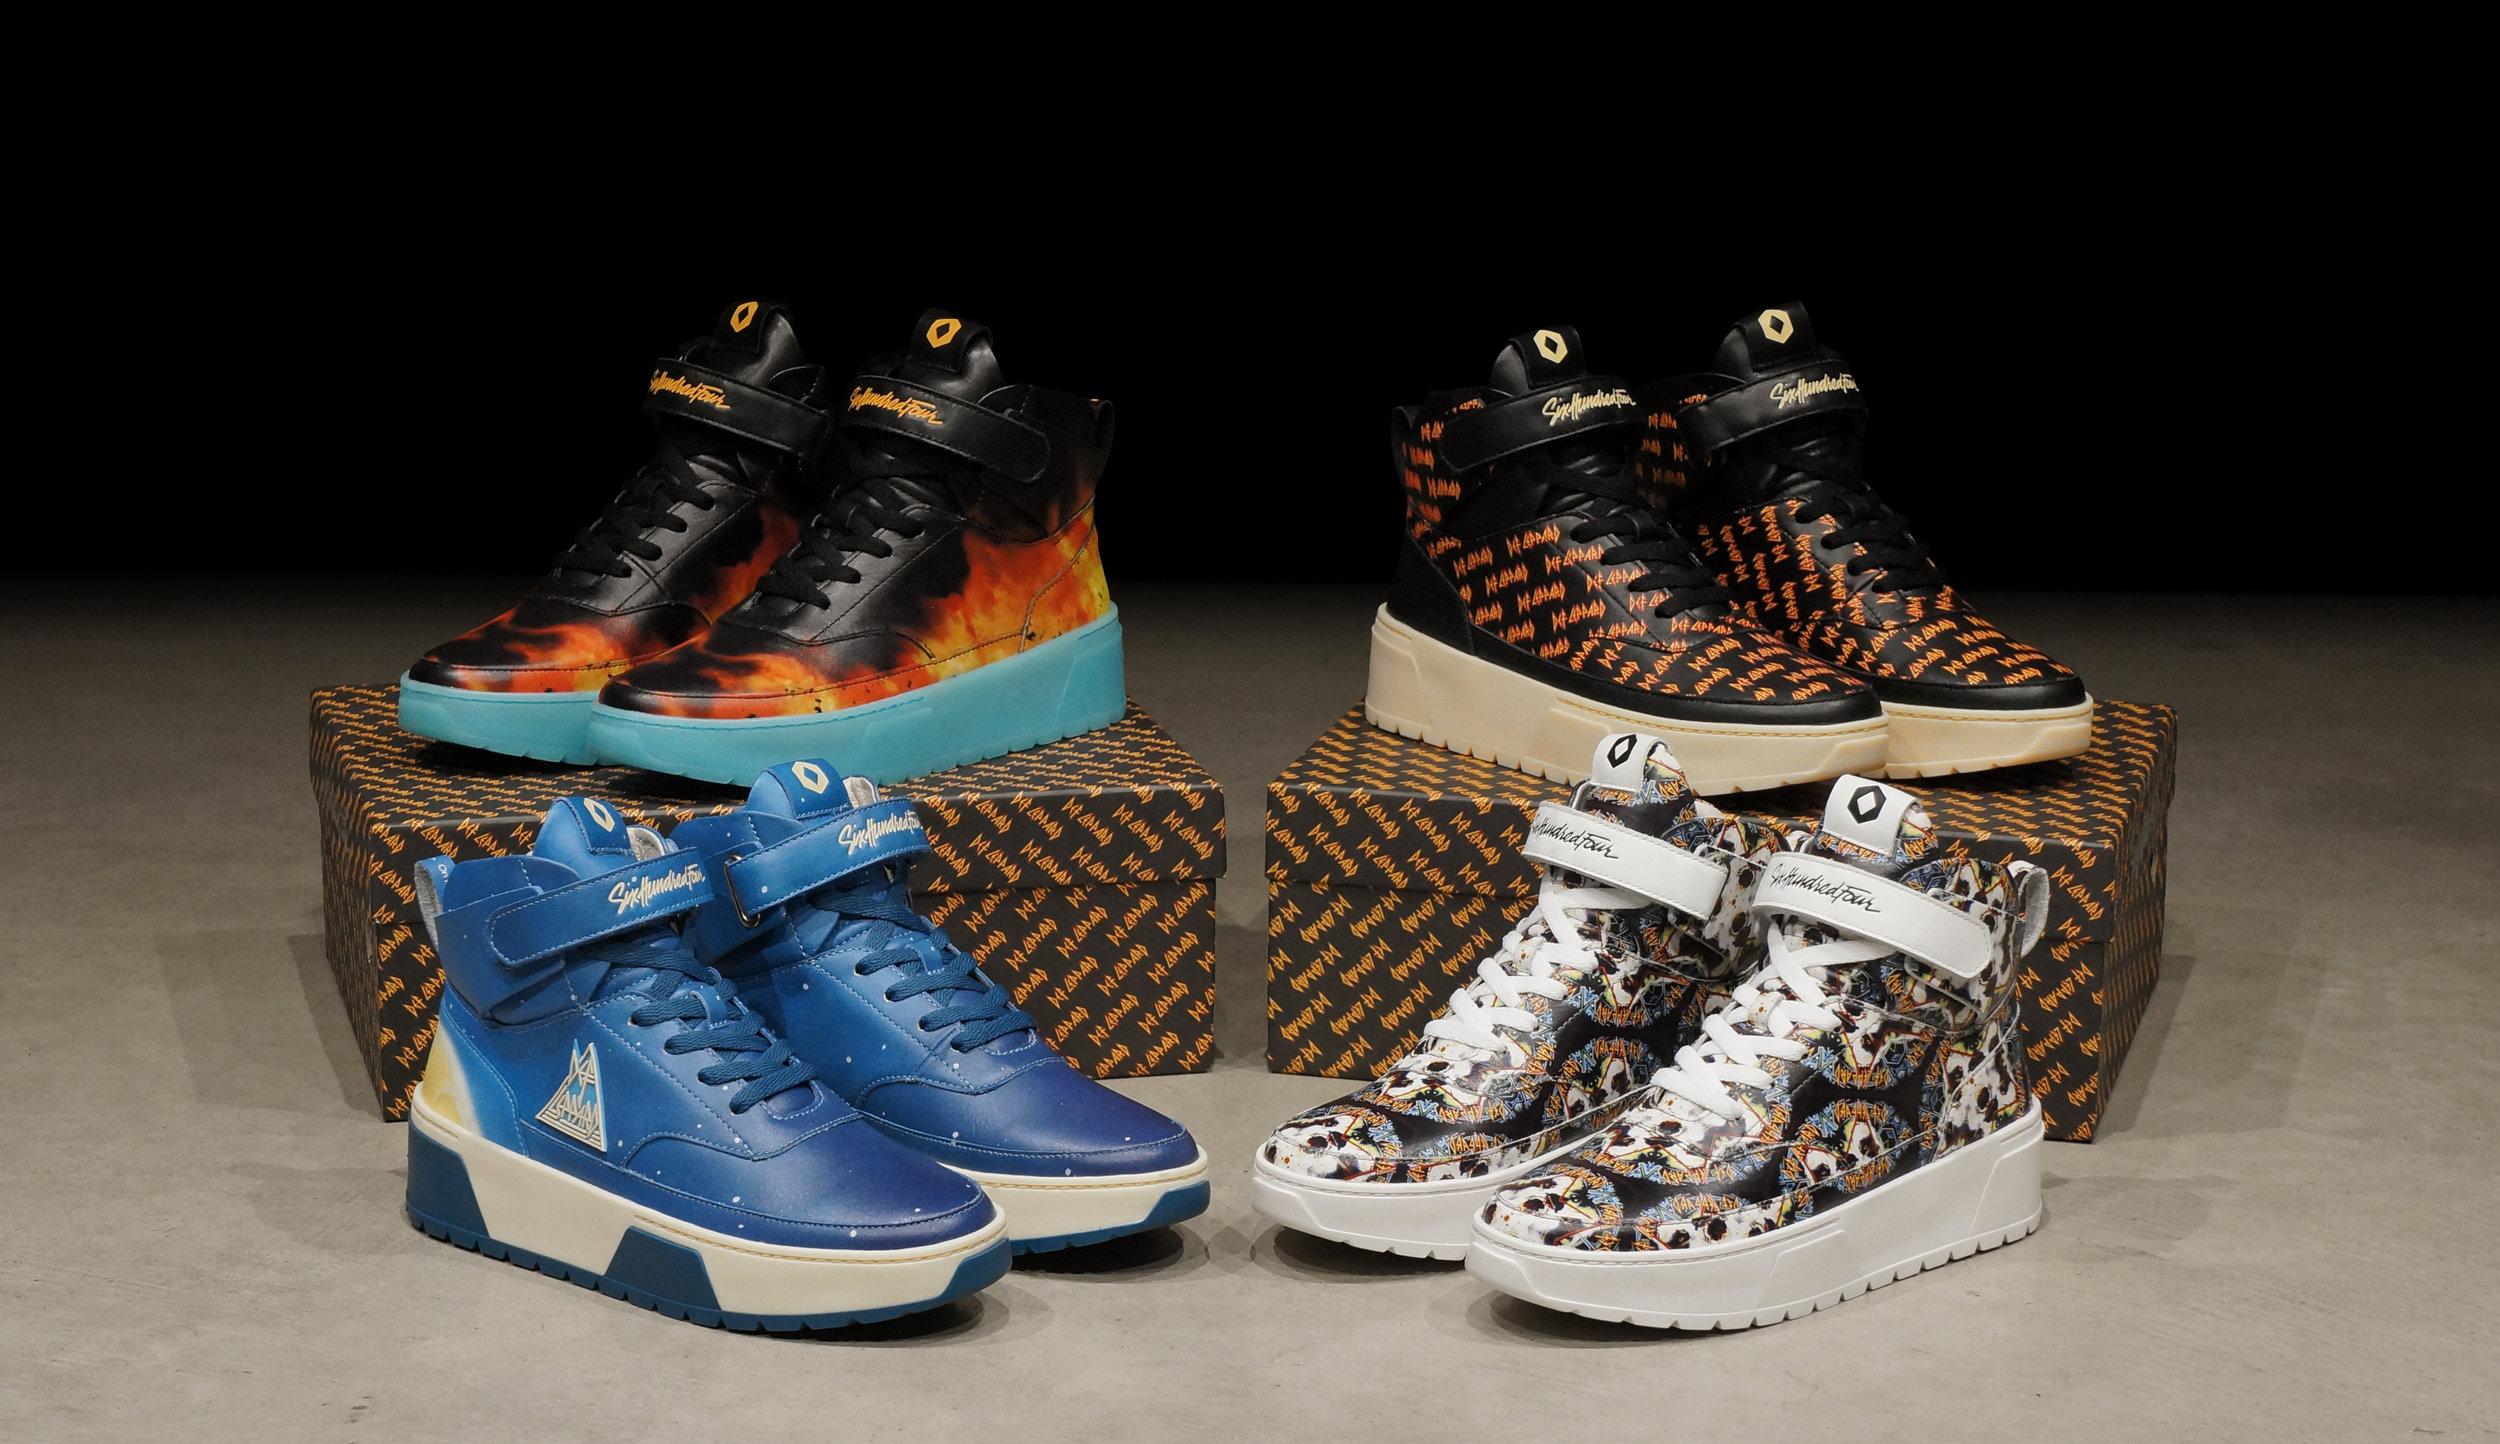 Def-Leppard-Shoes-Six-Hundred-Four-Box-Set-Image-01.jpg